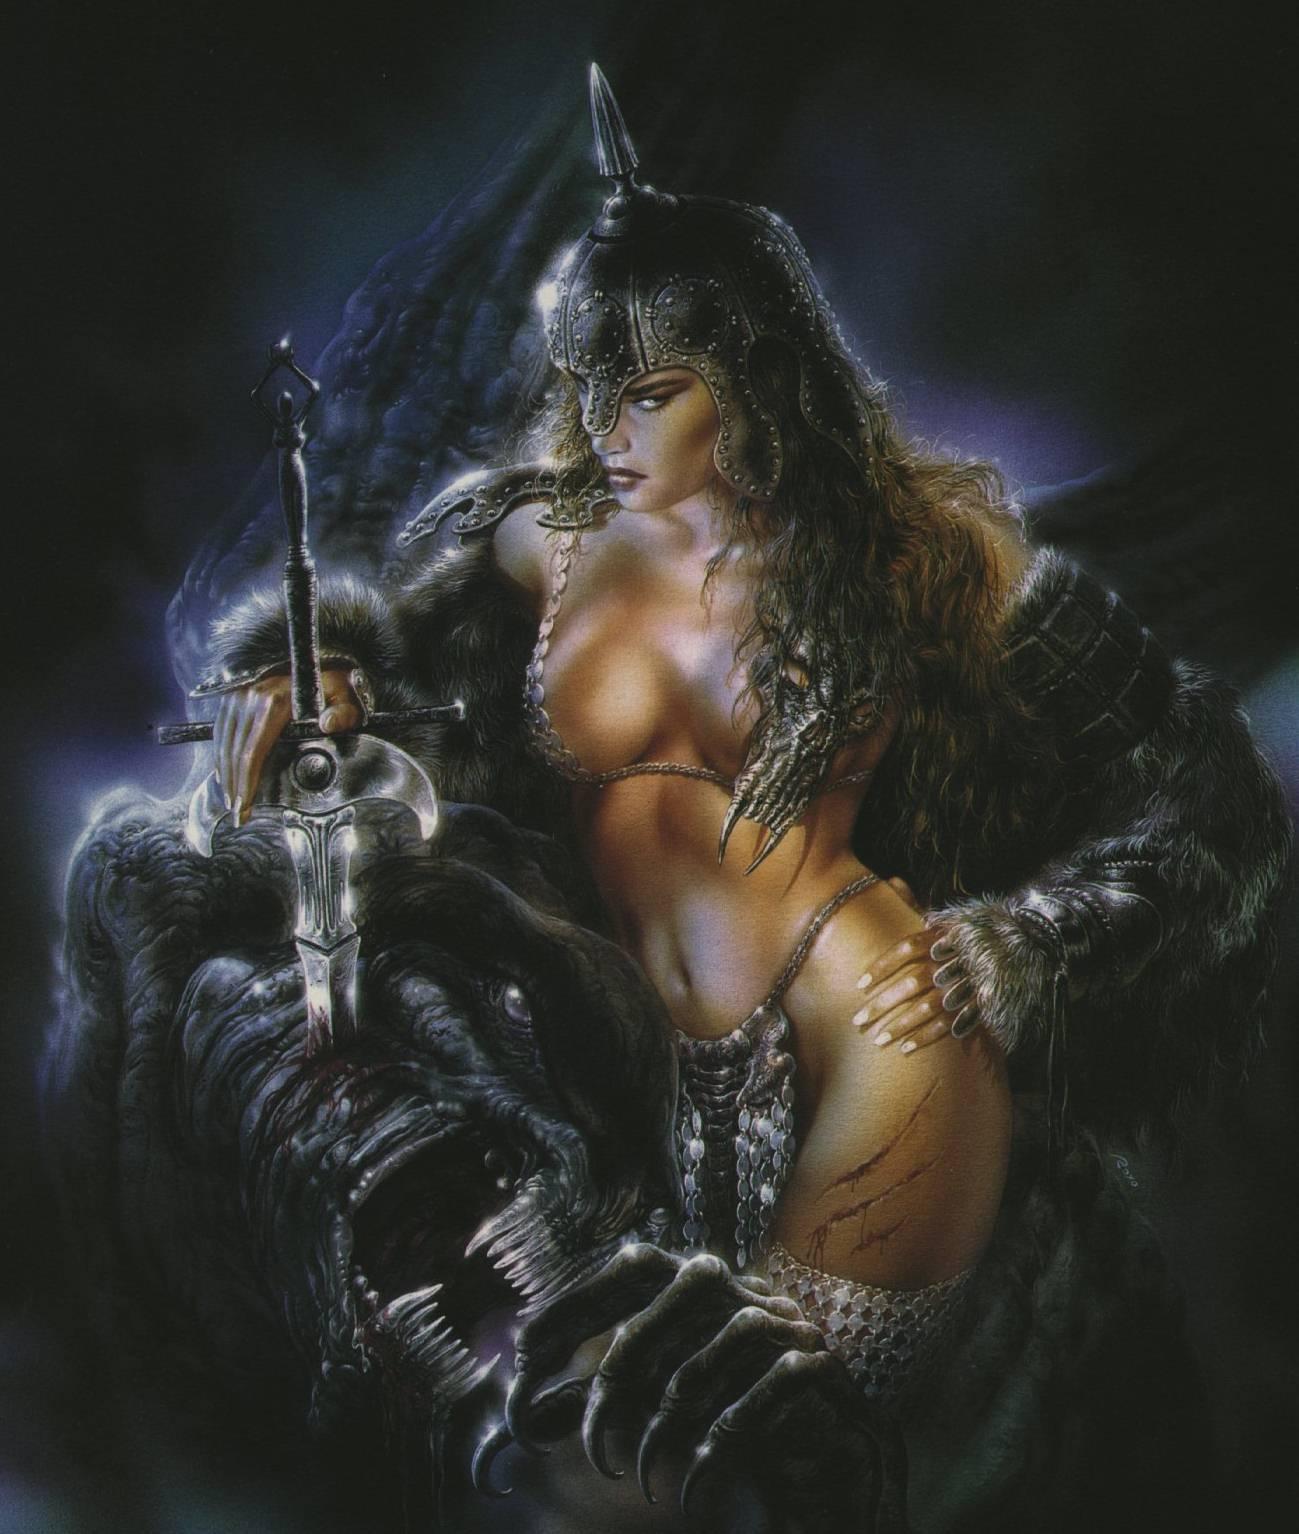 Warrior woman fantasyporn pictures erotica thumbs